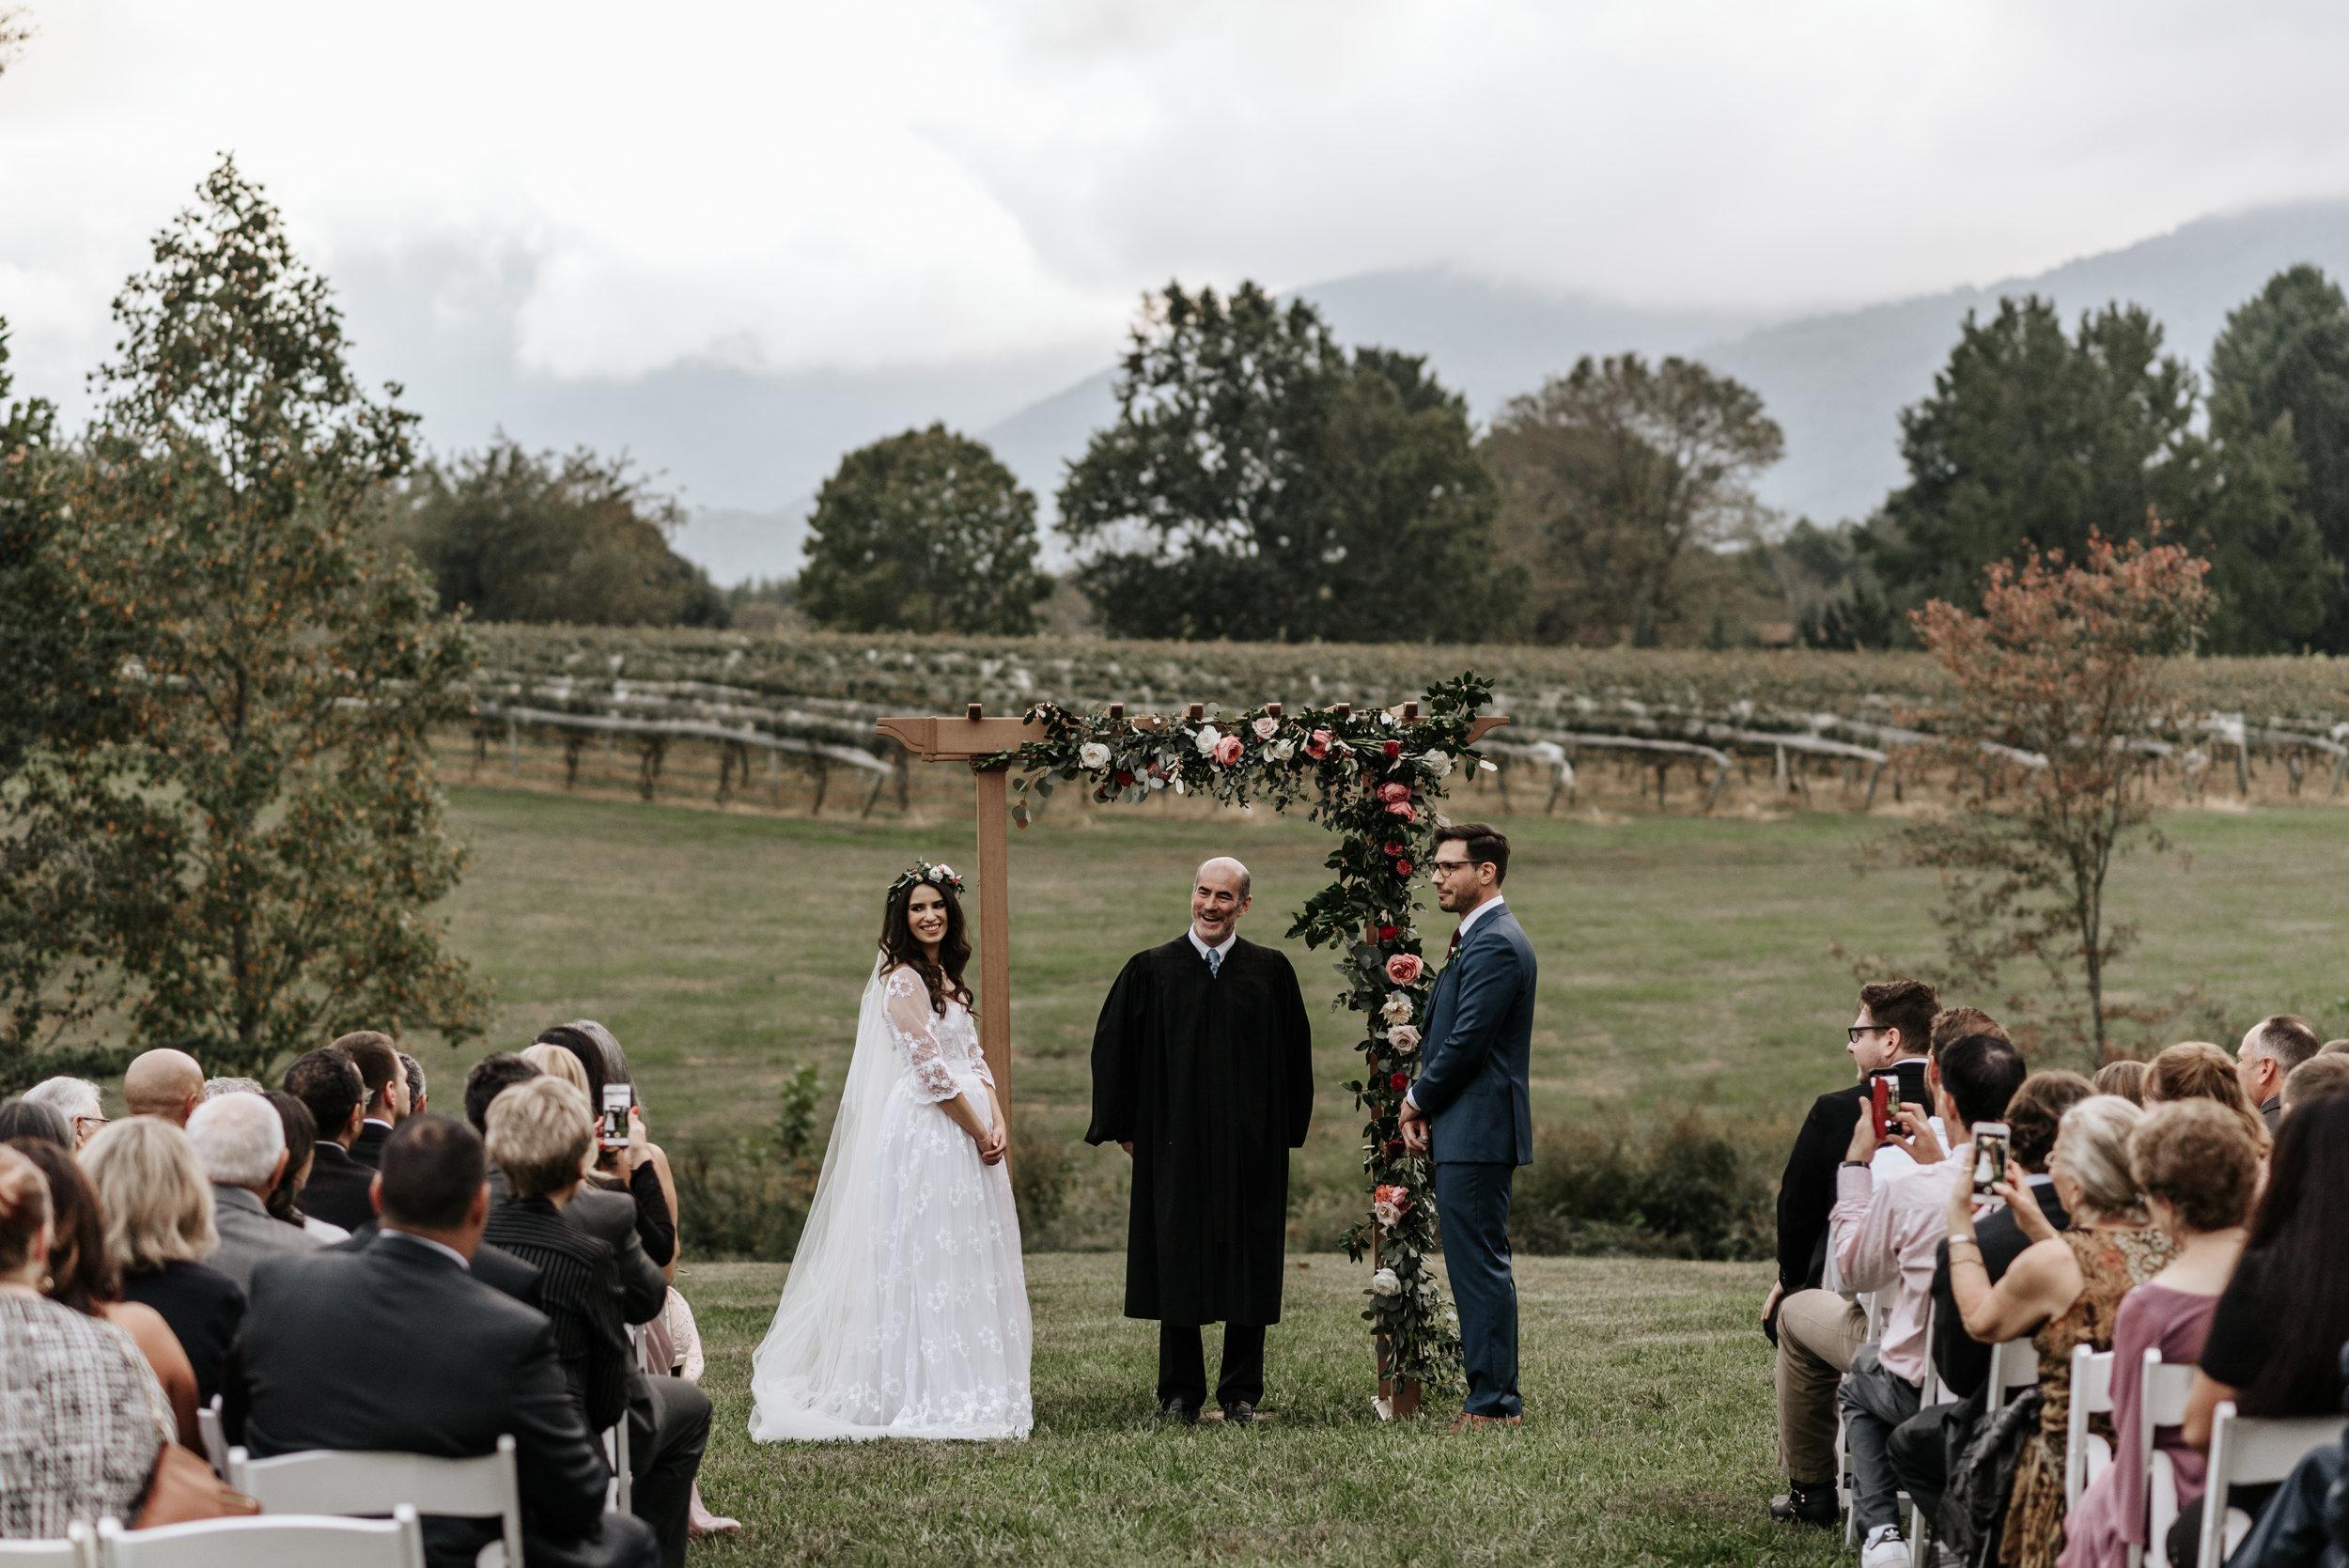 Veritas-Vineyards-and-Winery-Wedding-Photography-Afton-Virginia-Yasmin-Seth-Photography-by-V-2789.jpg